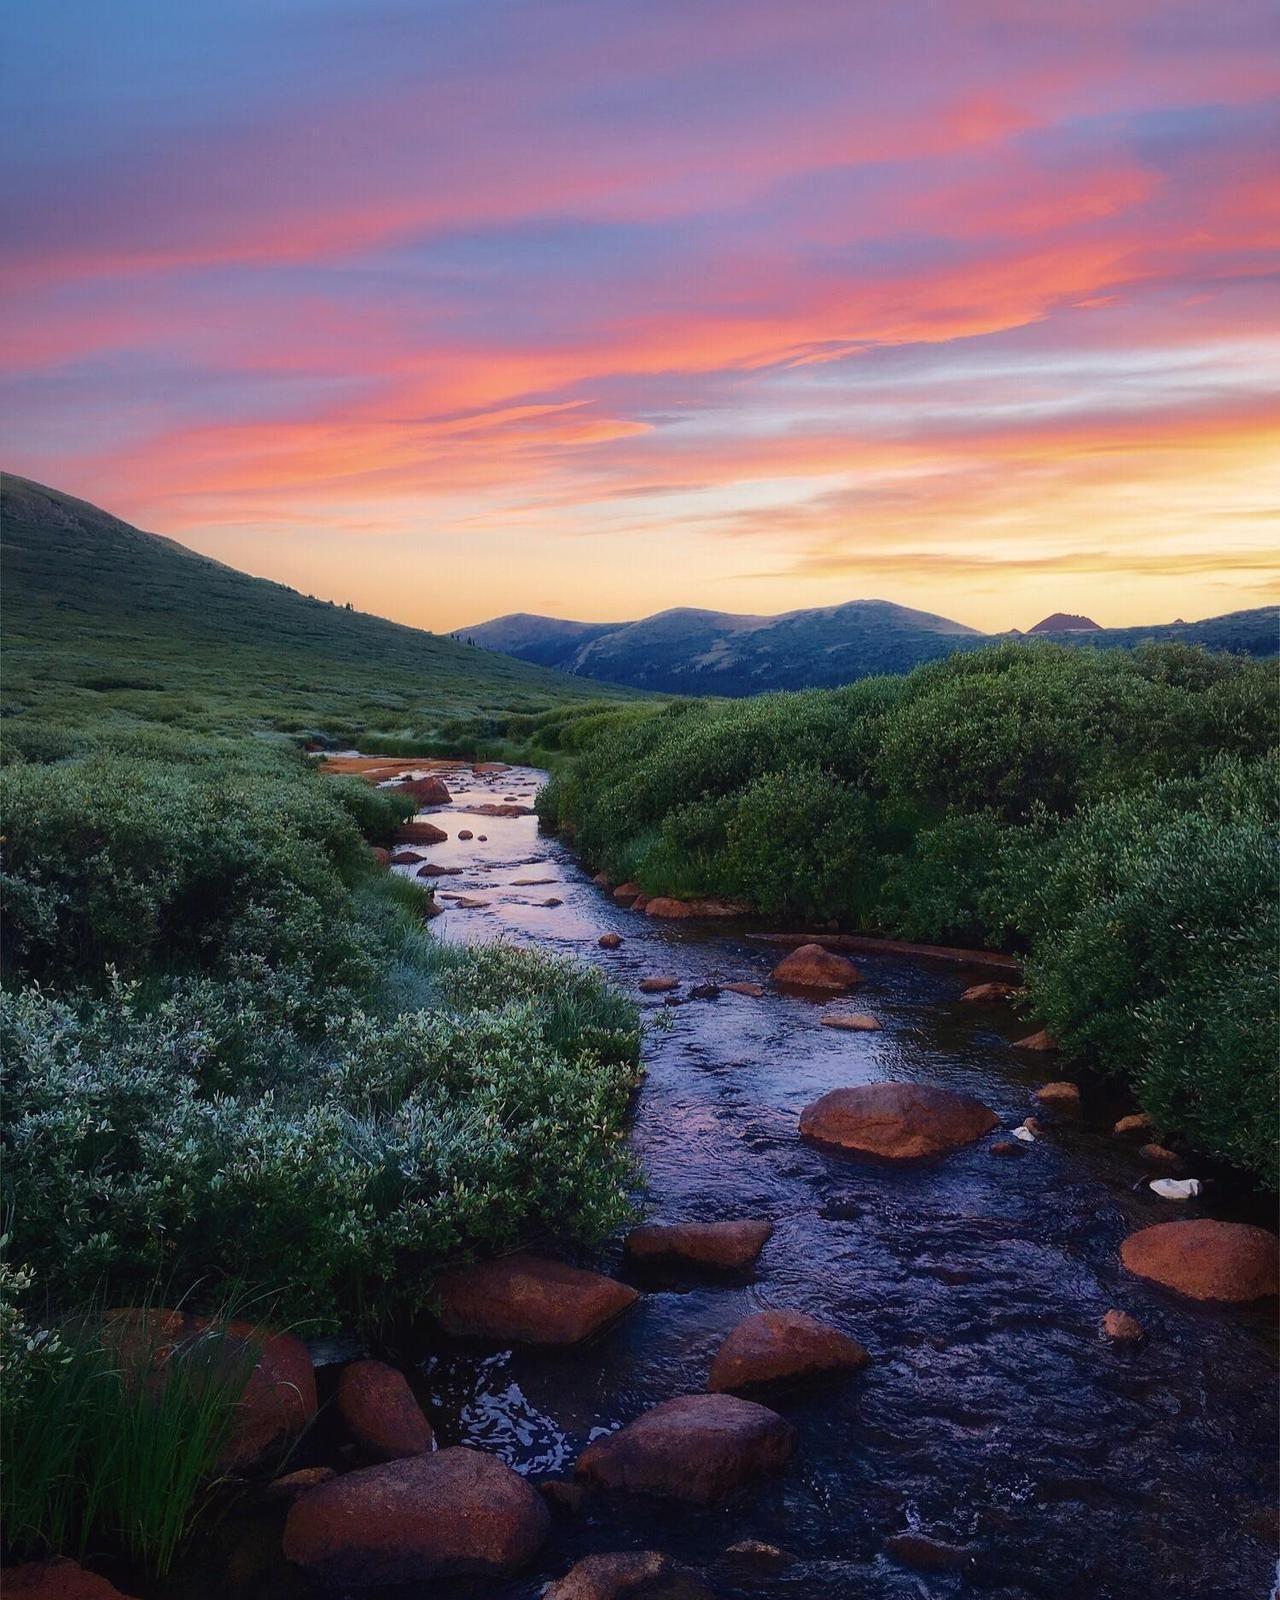 A Beautiful Summer Evening At Mount Bierstadt Colorado Nature Photography Landscape Photography Nature Summer Landscape Summer Nature Photography